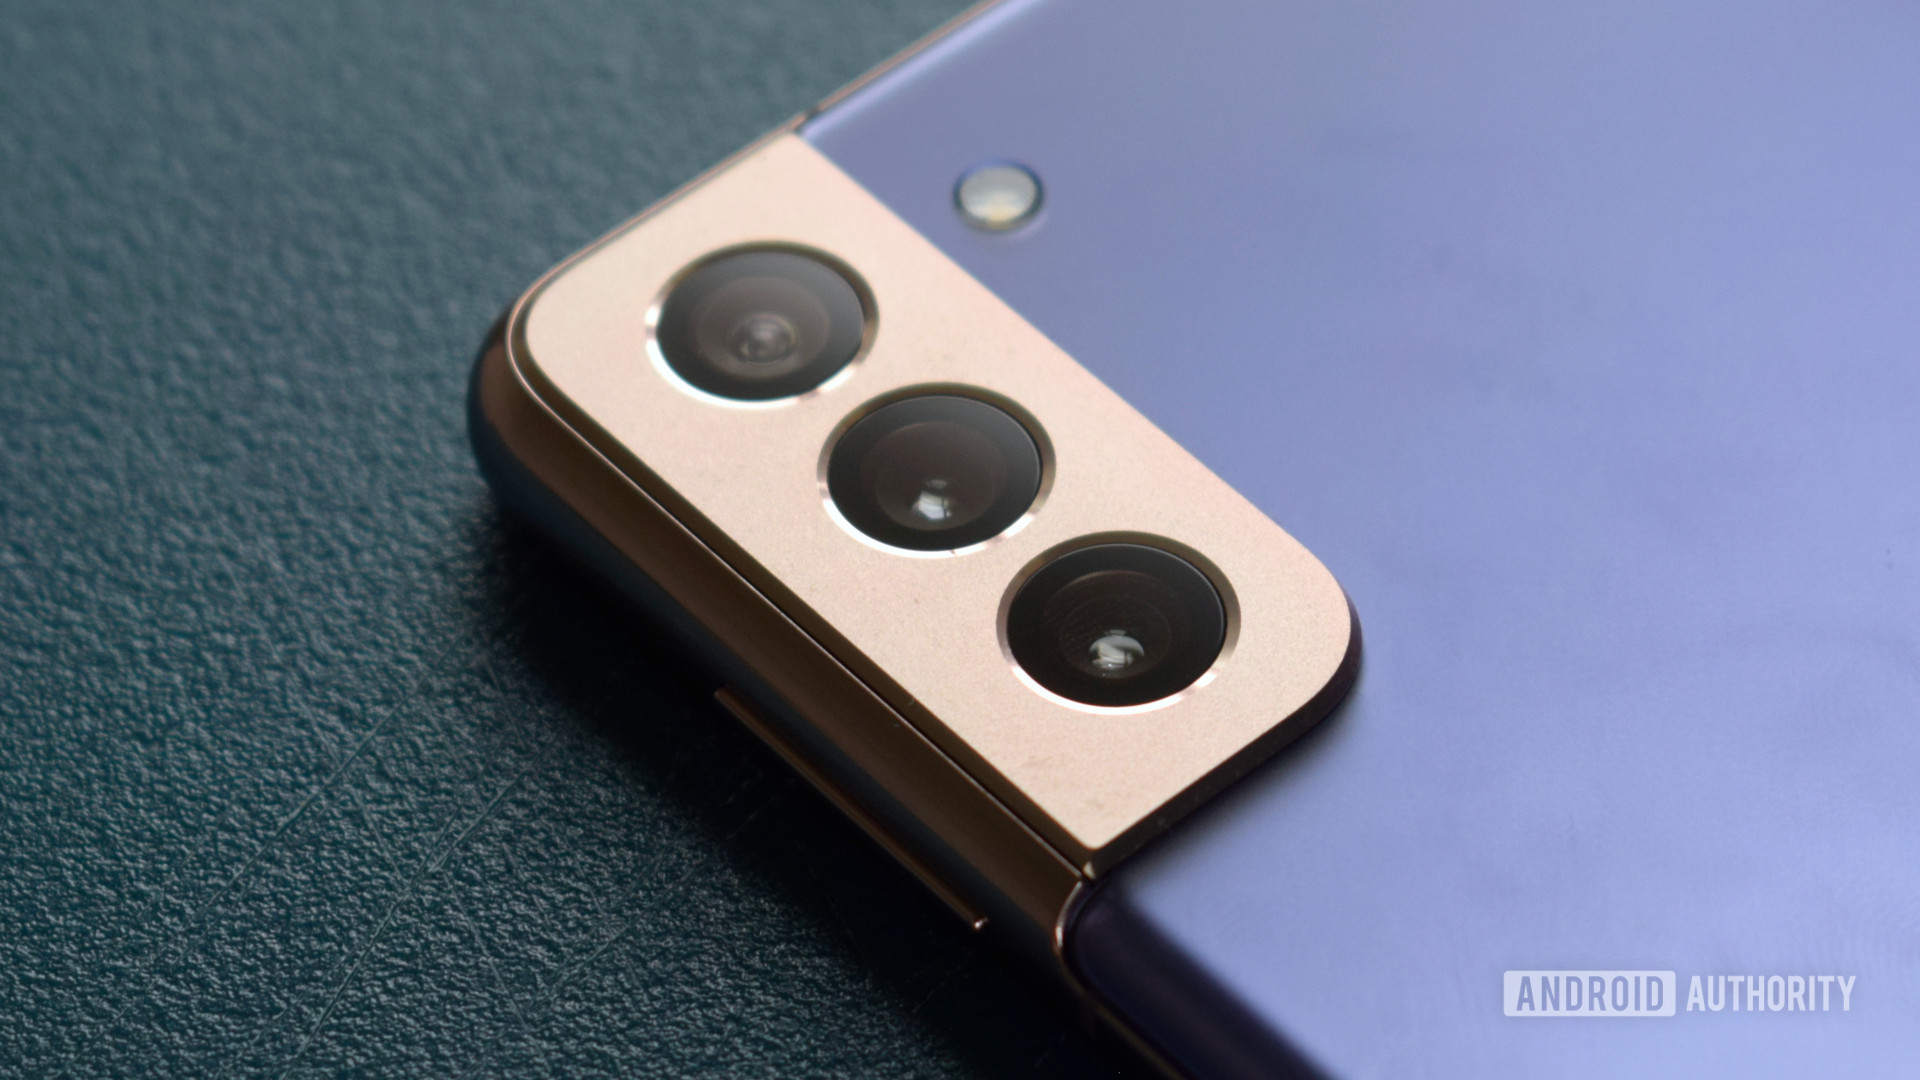 Samsung Galaxy S21 Plus camera